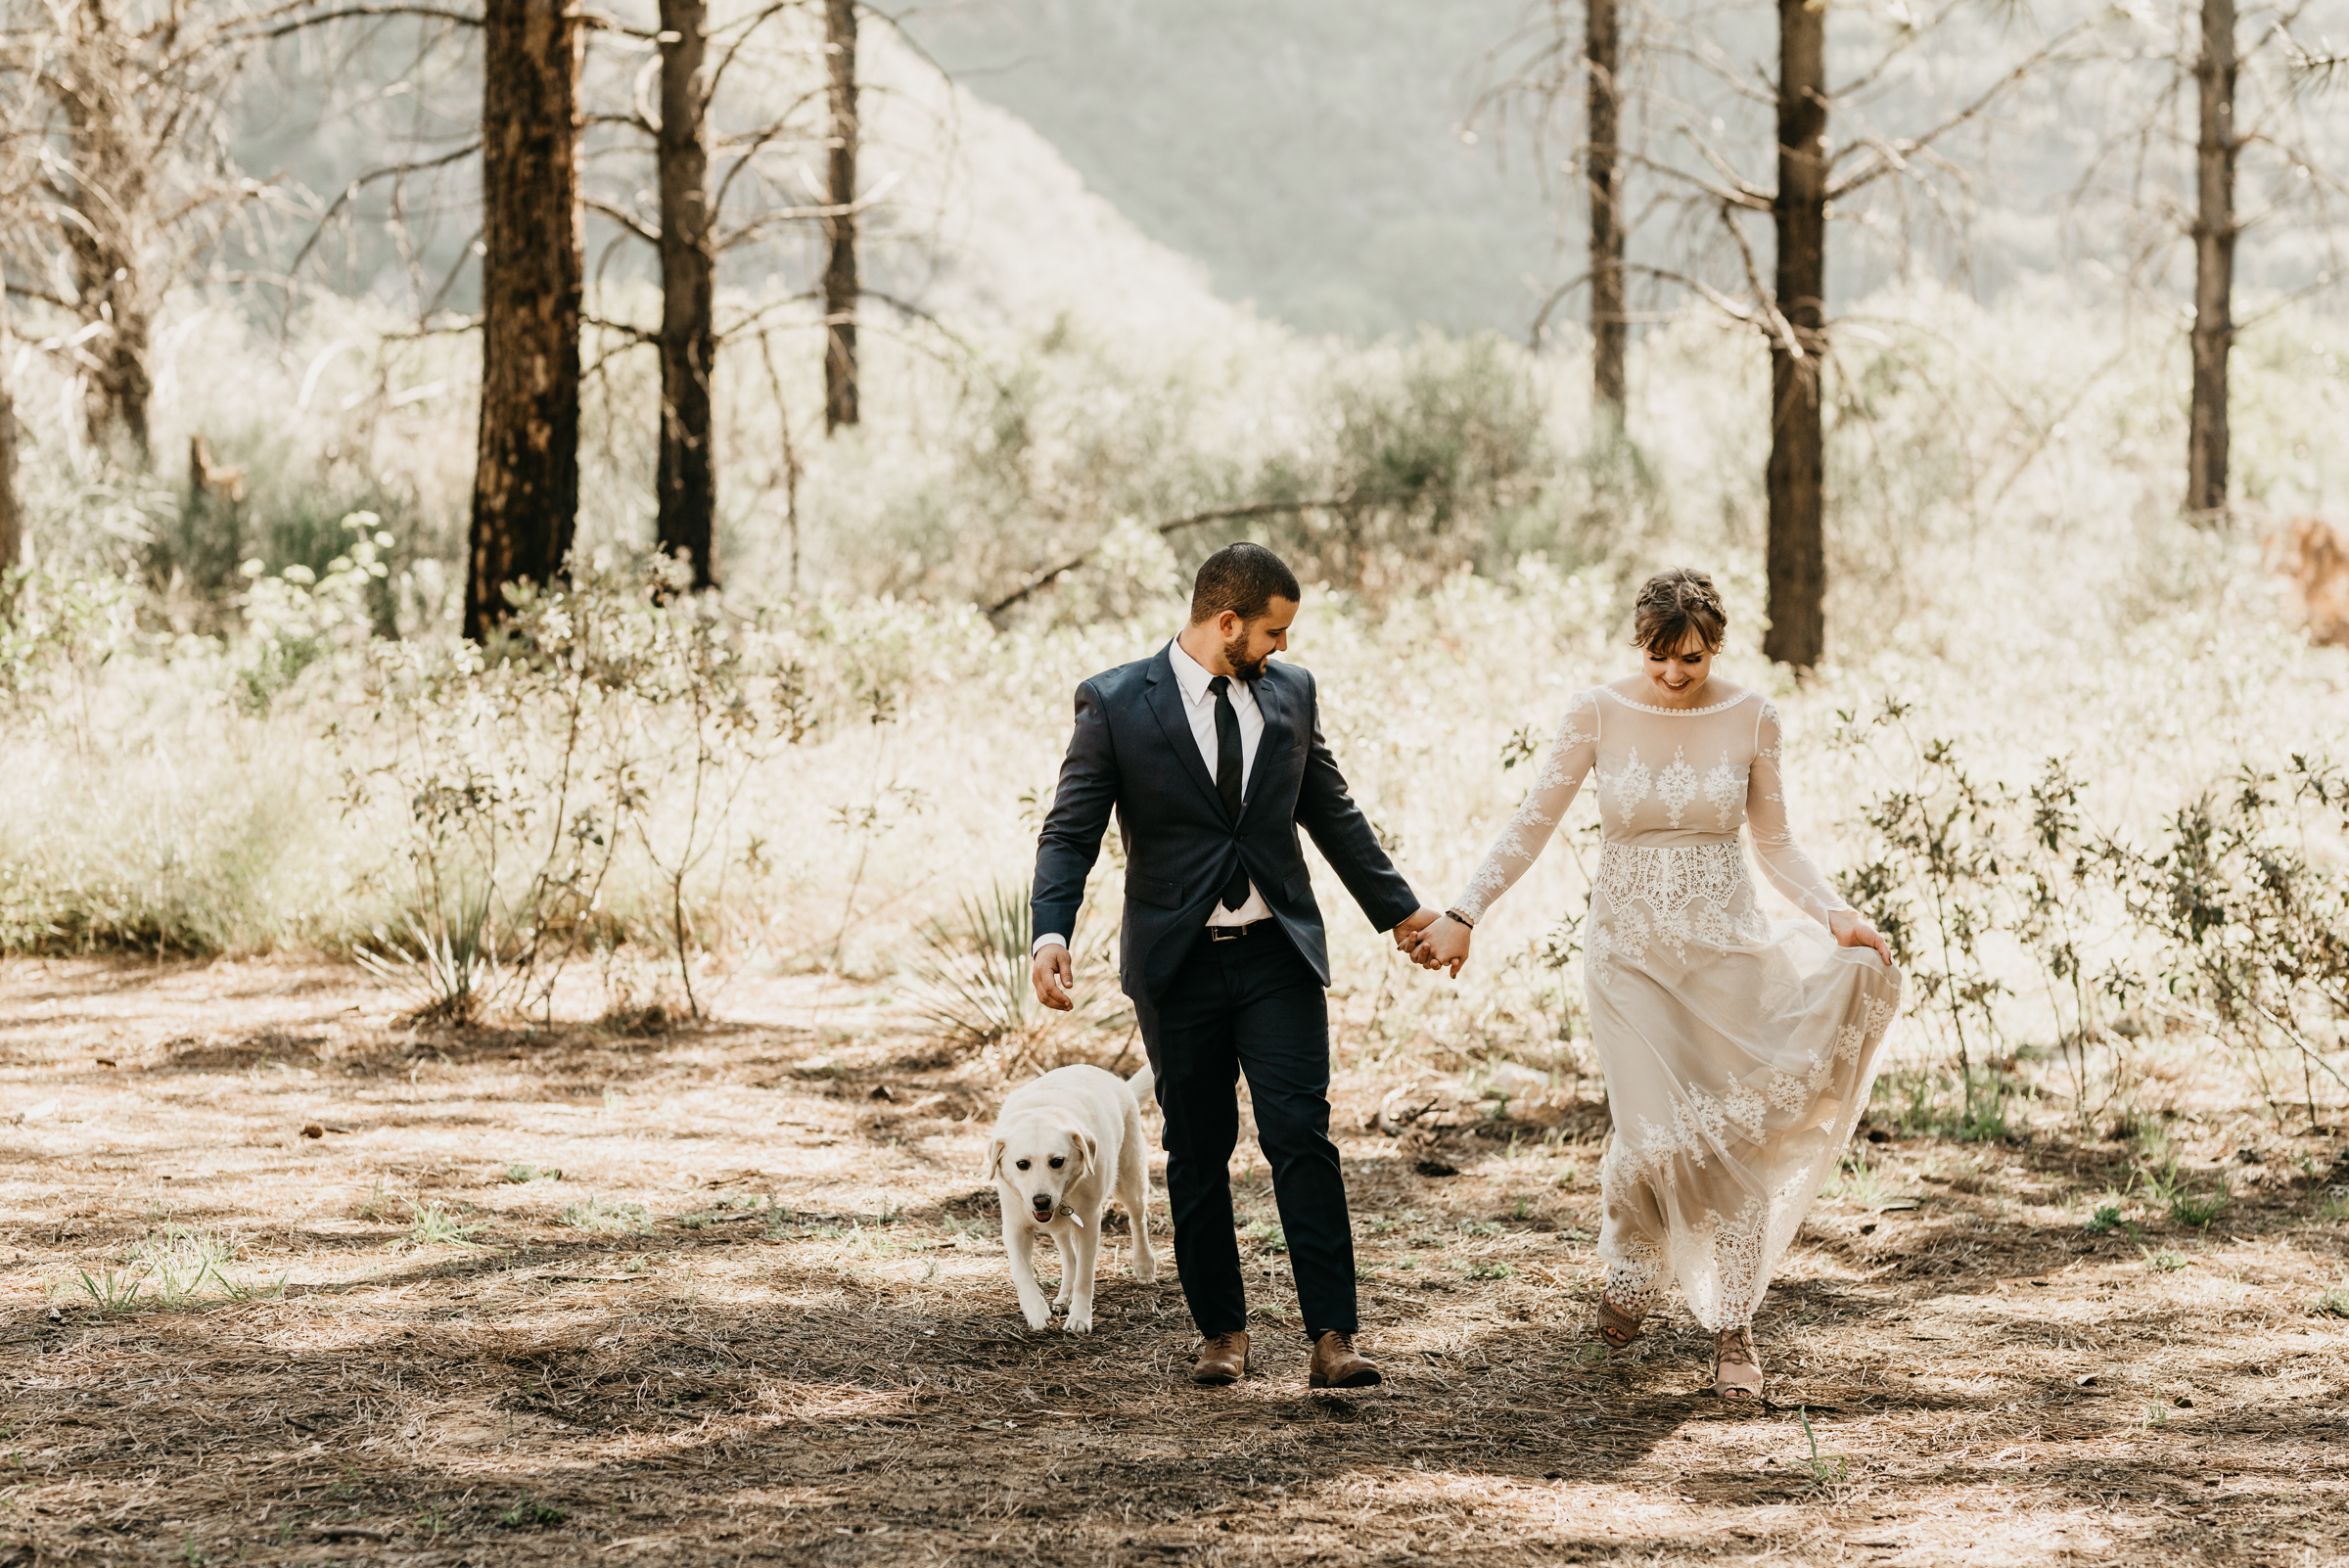 ©Isaiah + Taylor Photography - Los Angeles Wedding Photographers - Los Angeles Forest Wedding -17.jpg